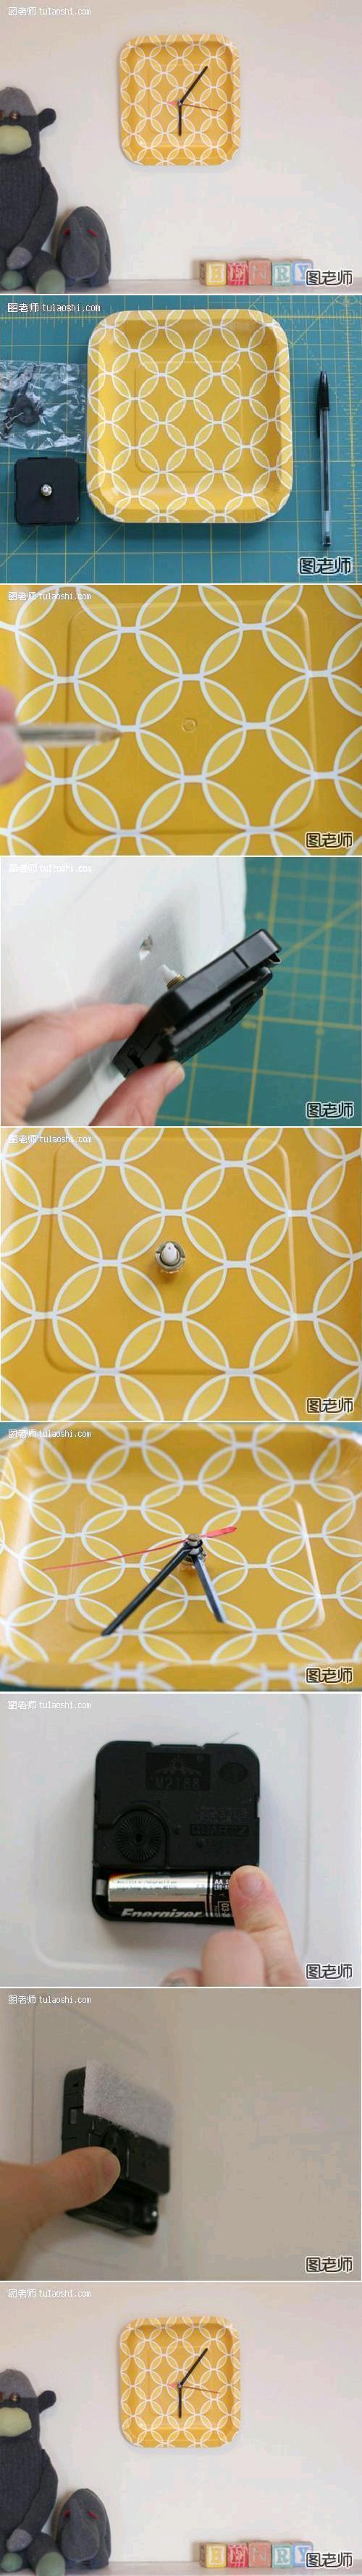 DIY Paper Plate Clock DIY Projects   UsefulDIY.com